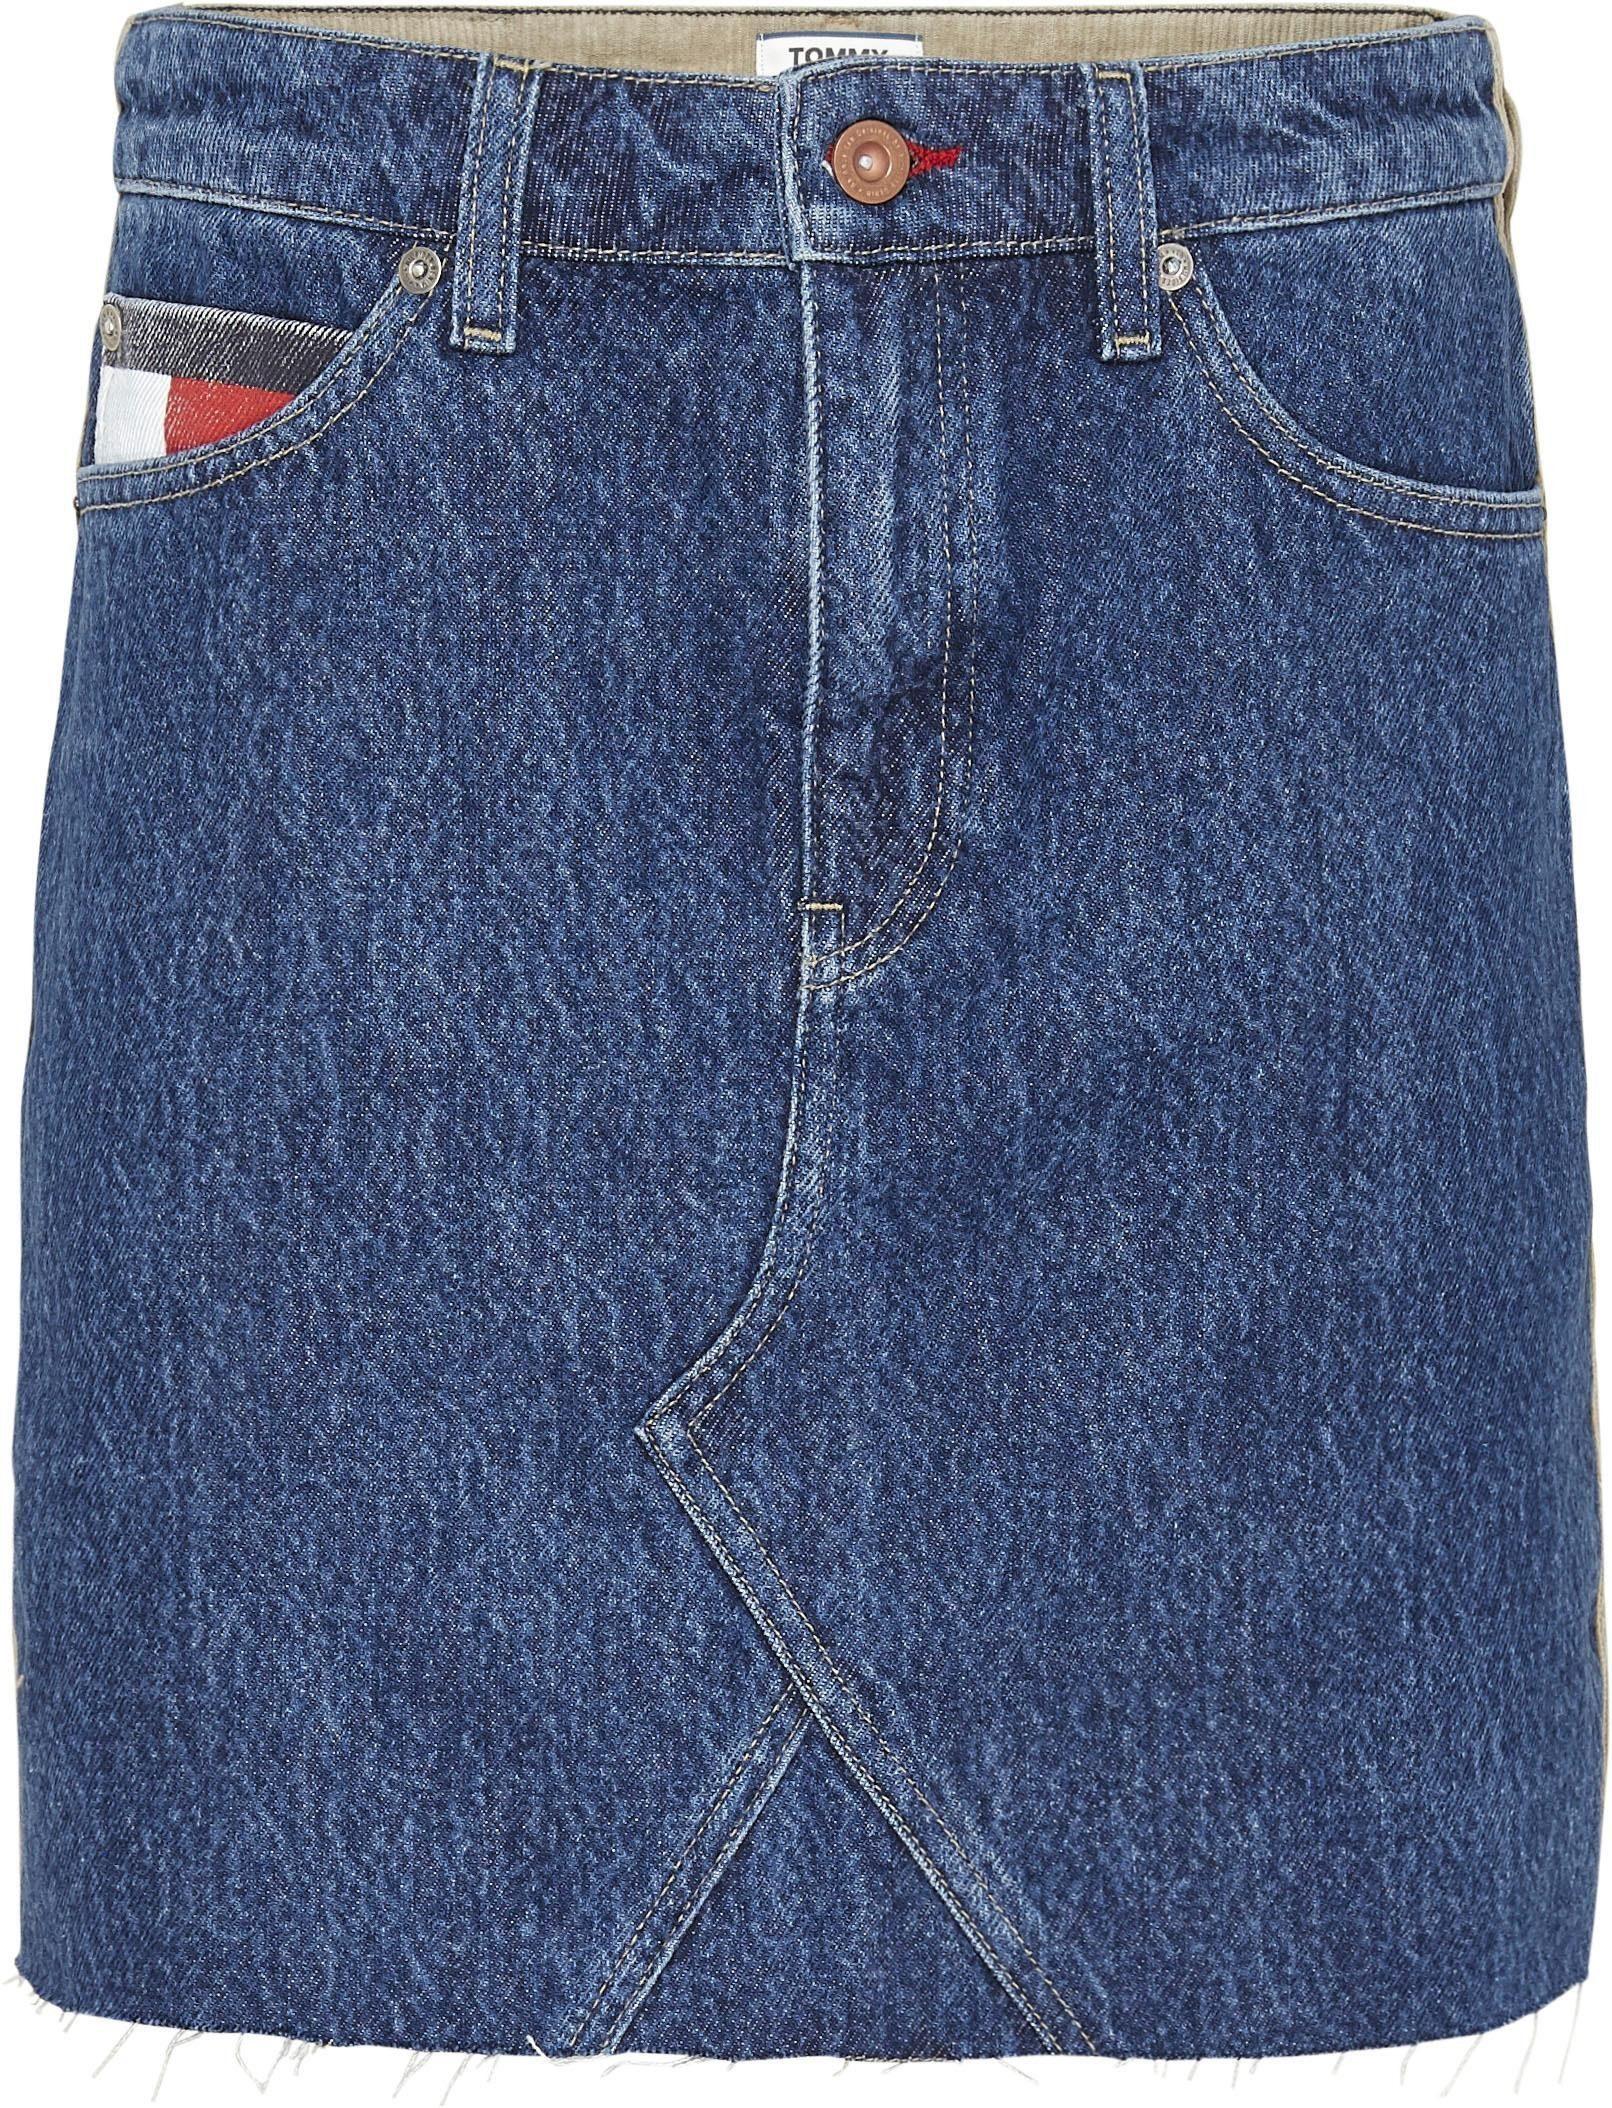 Tommy Jeans Jeansrok Short Denim Skirt Nwcr Online Verkrijgbaar - Geweldige Prijs